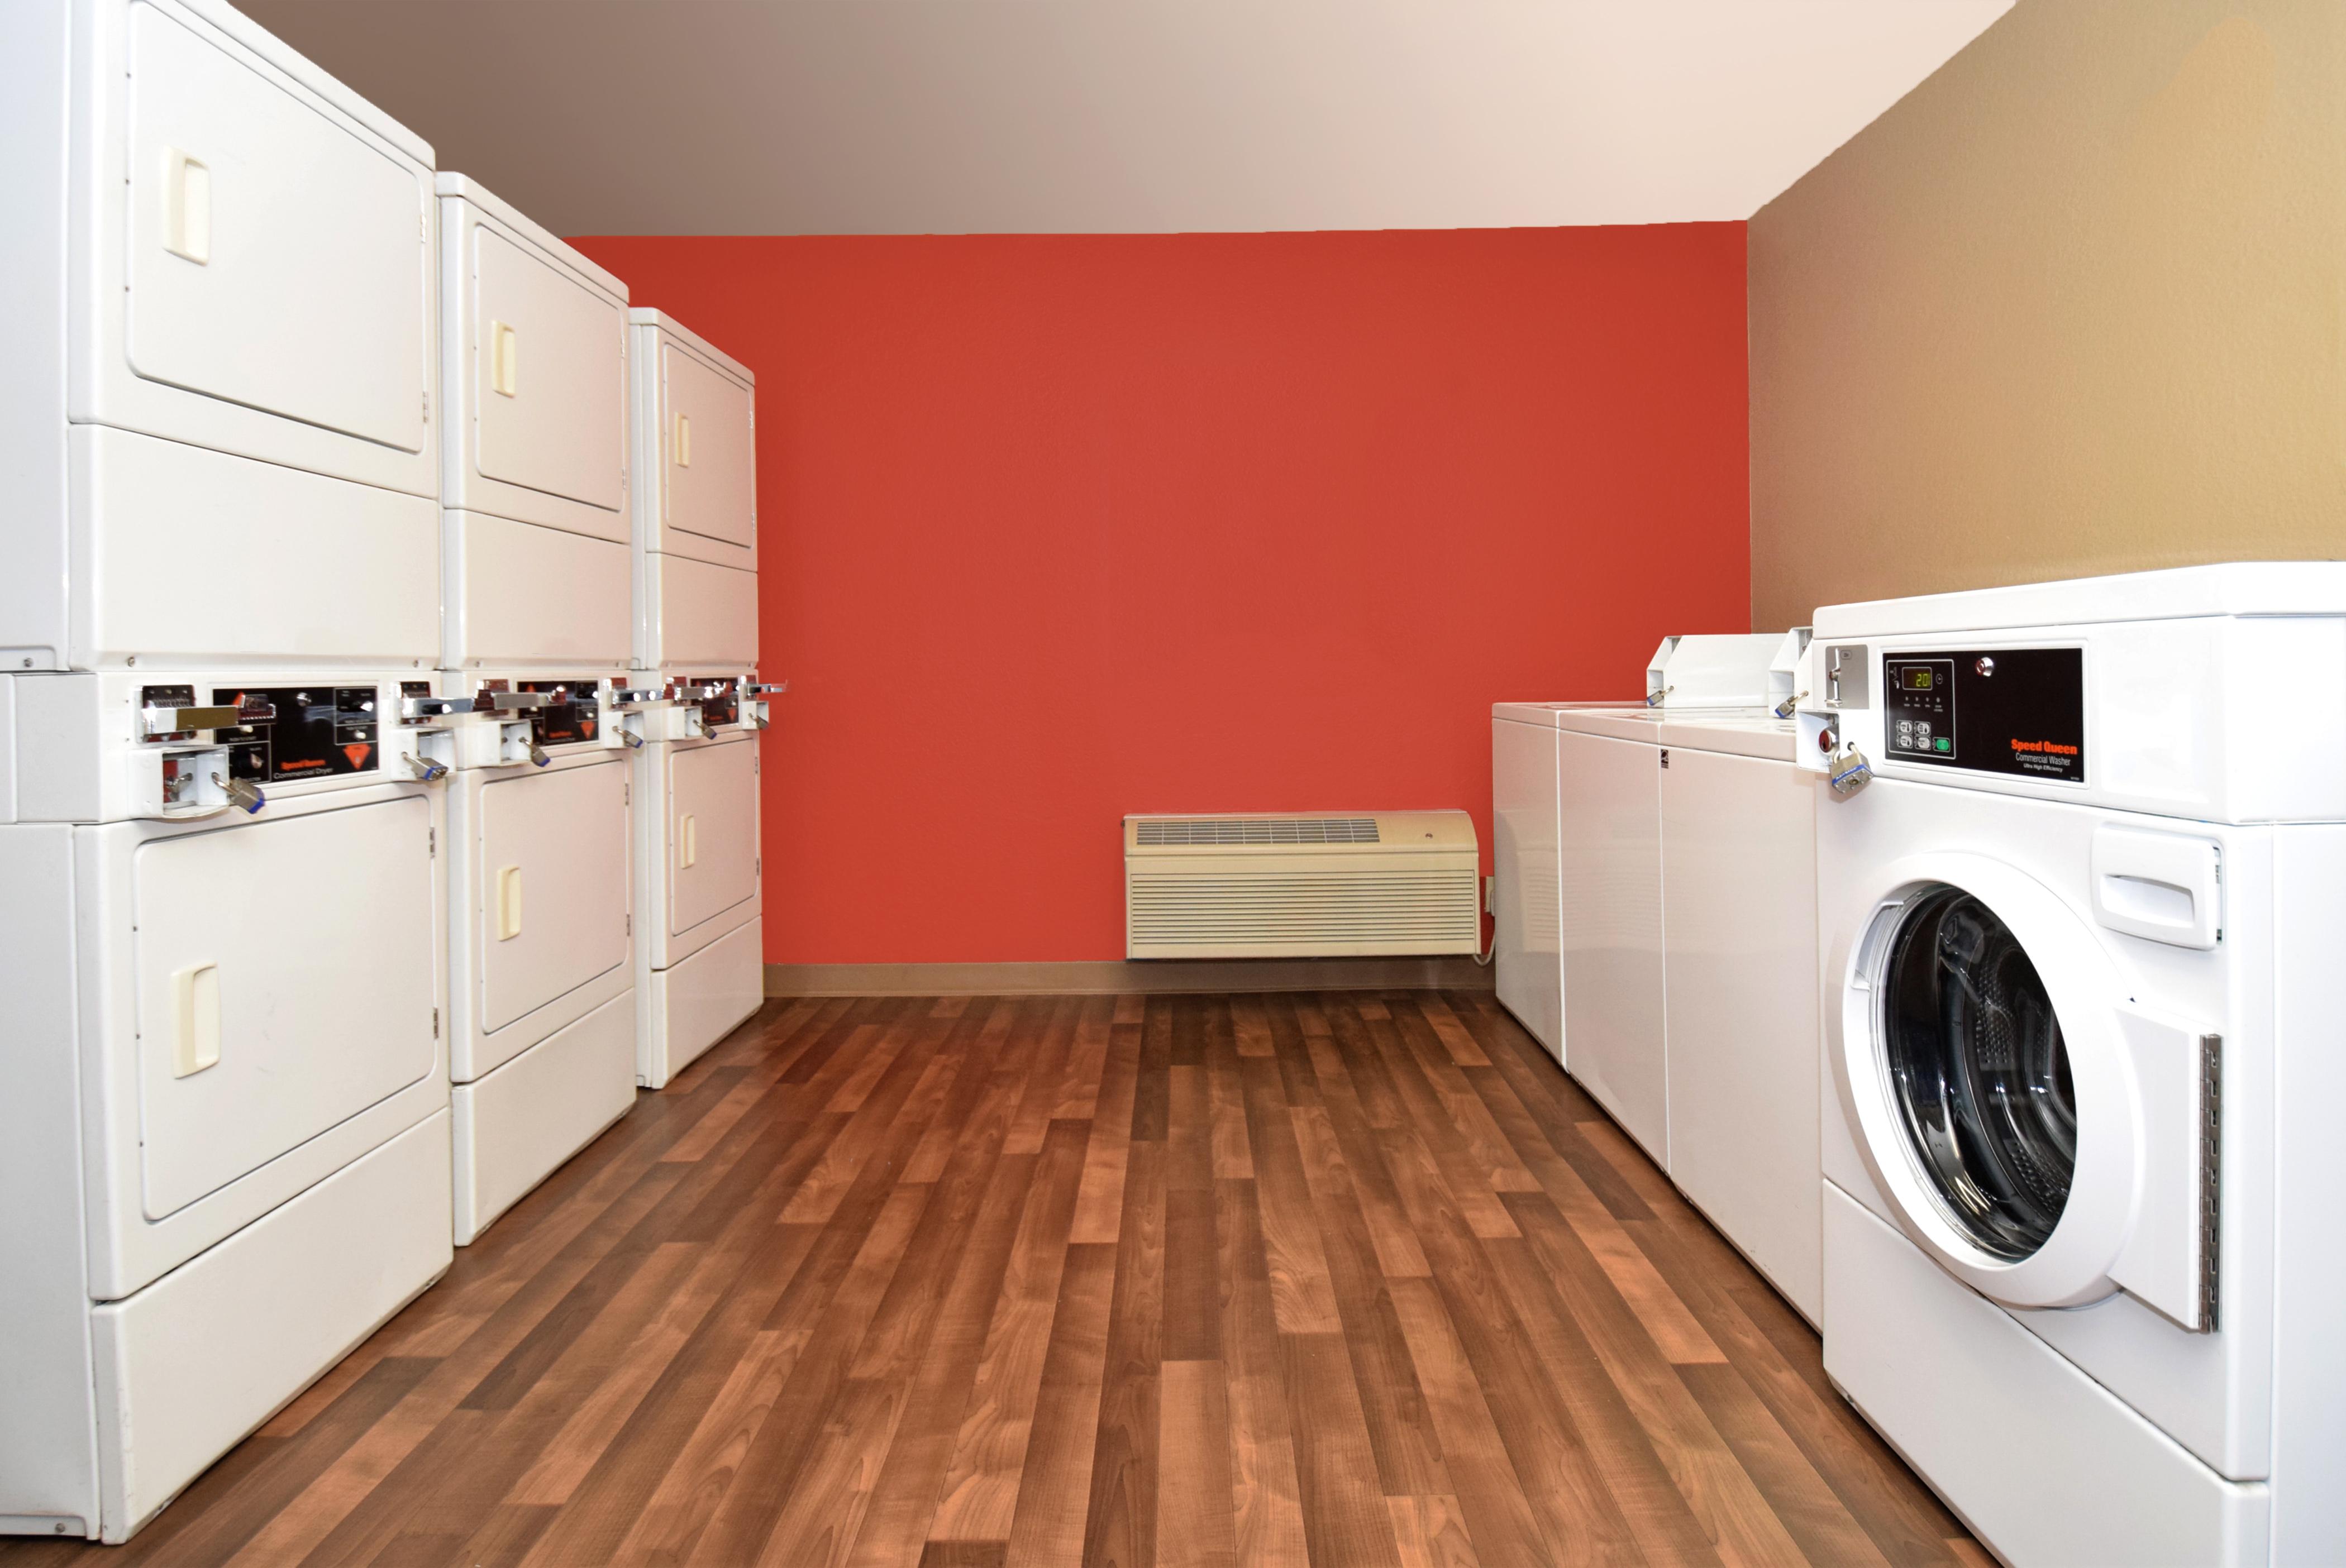 ESA_laundry_4200x2808.jpg